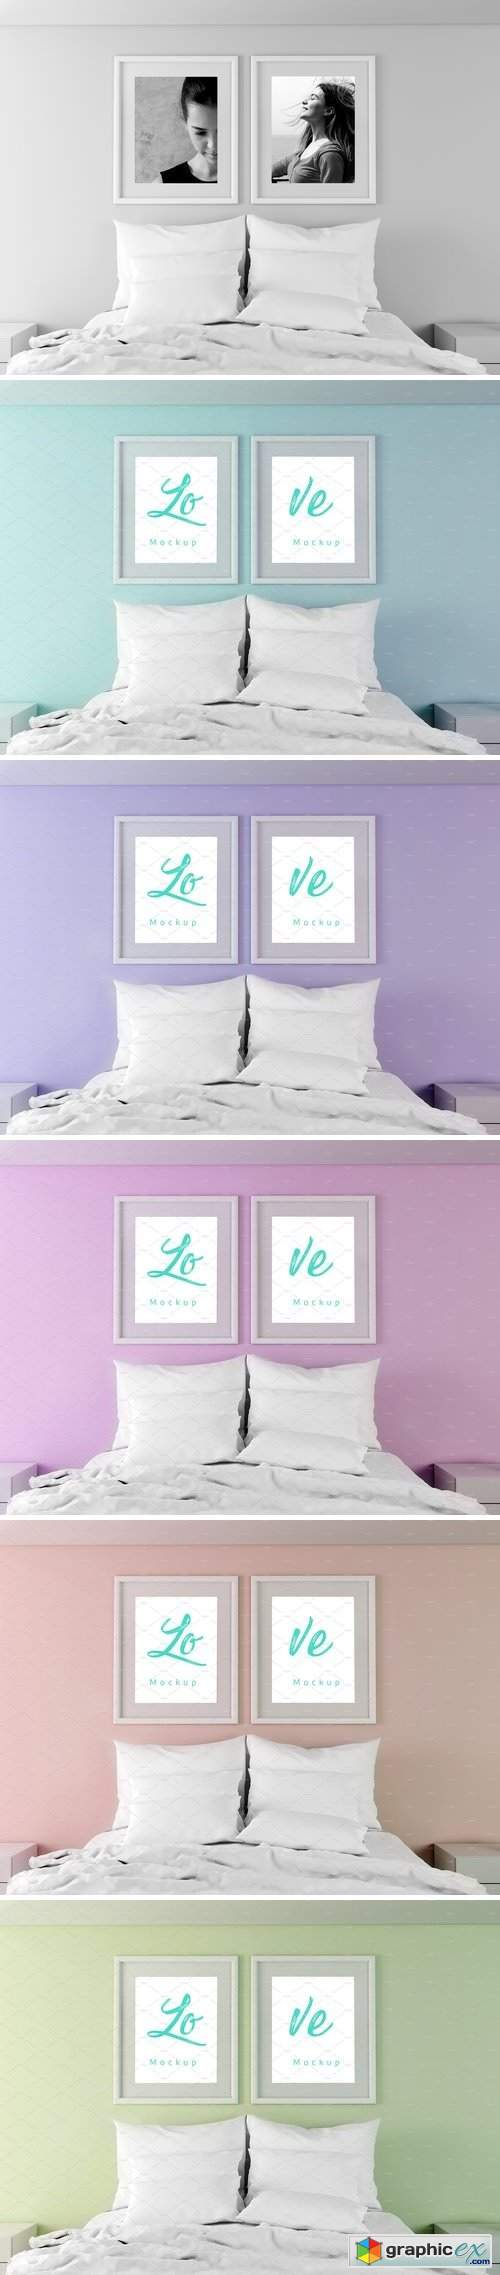 Bedroom Portrait Frame Mockup Psd Free Download Vector Stock